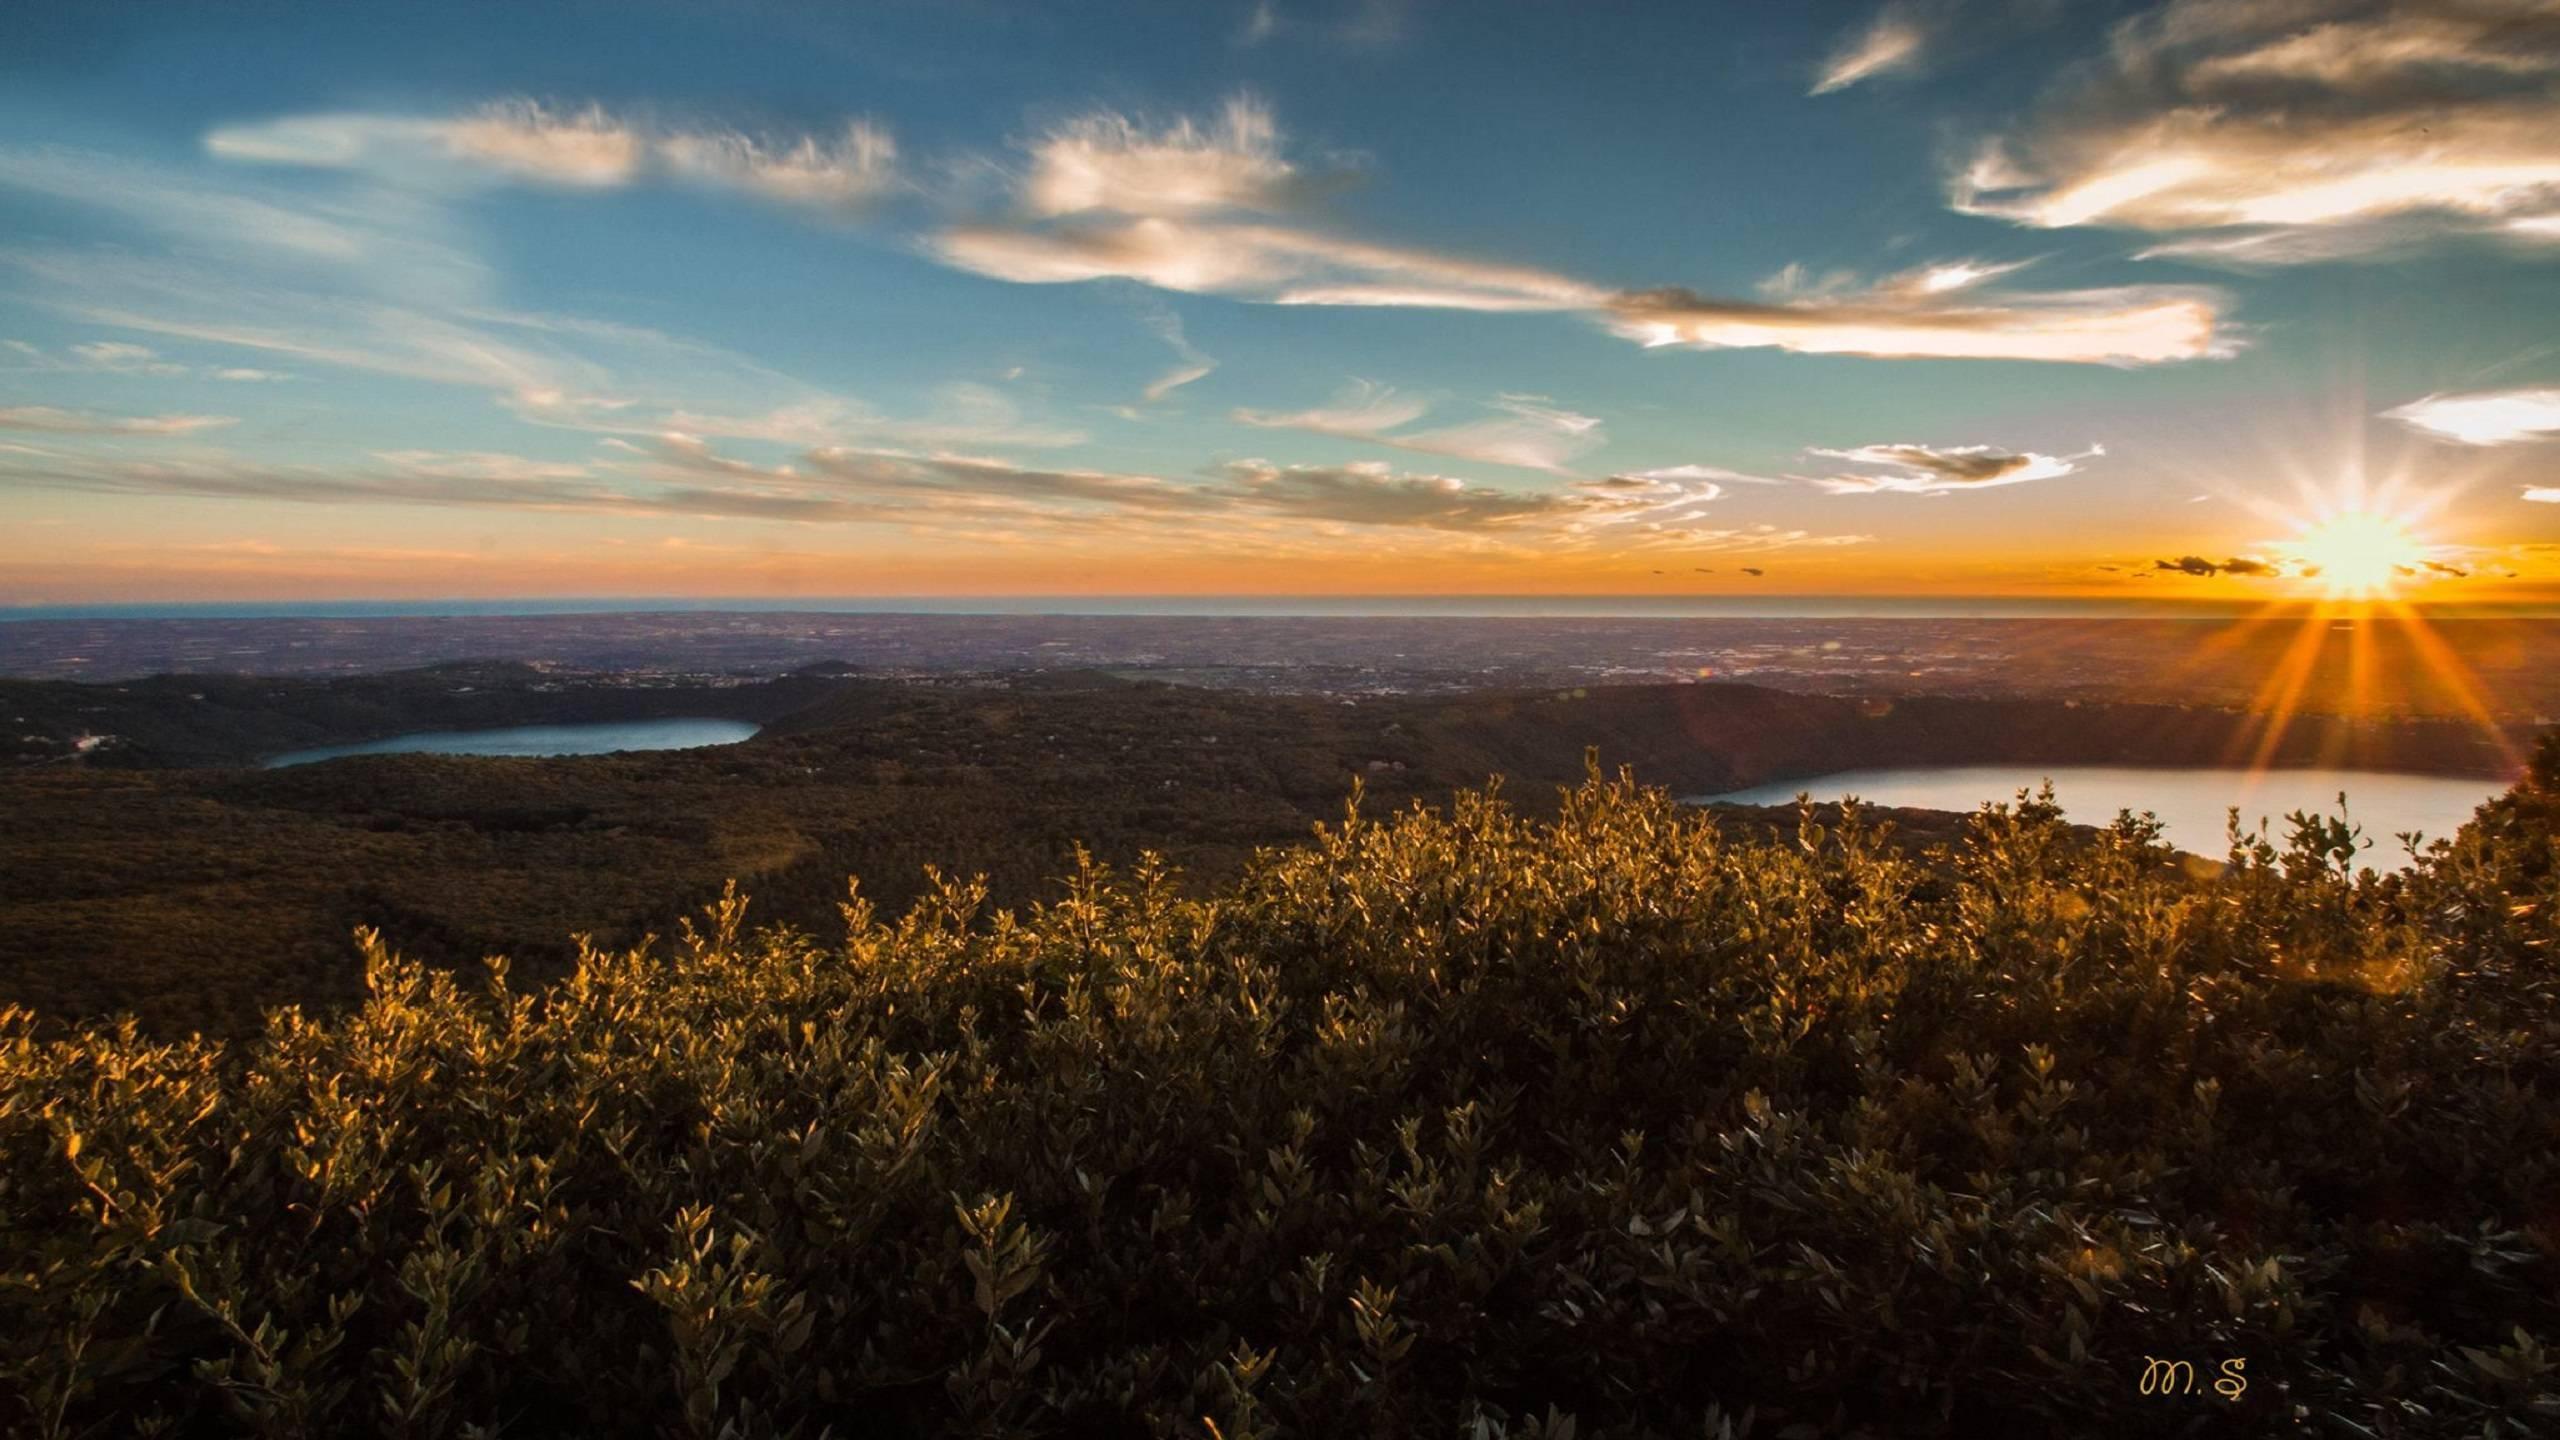 monte-cavo-between-the-two-lakes-castel-gandolfo-nemi